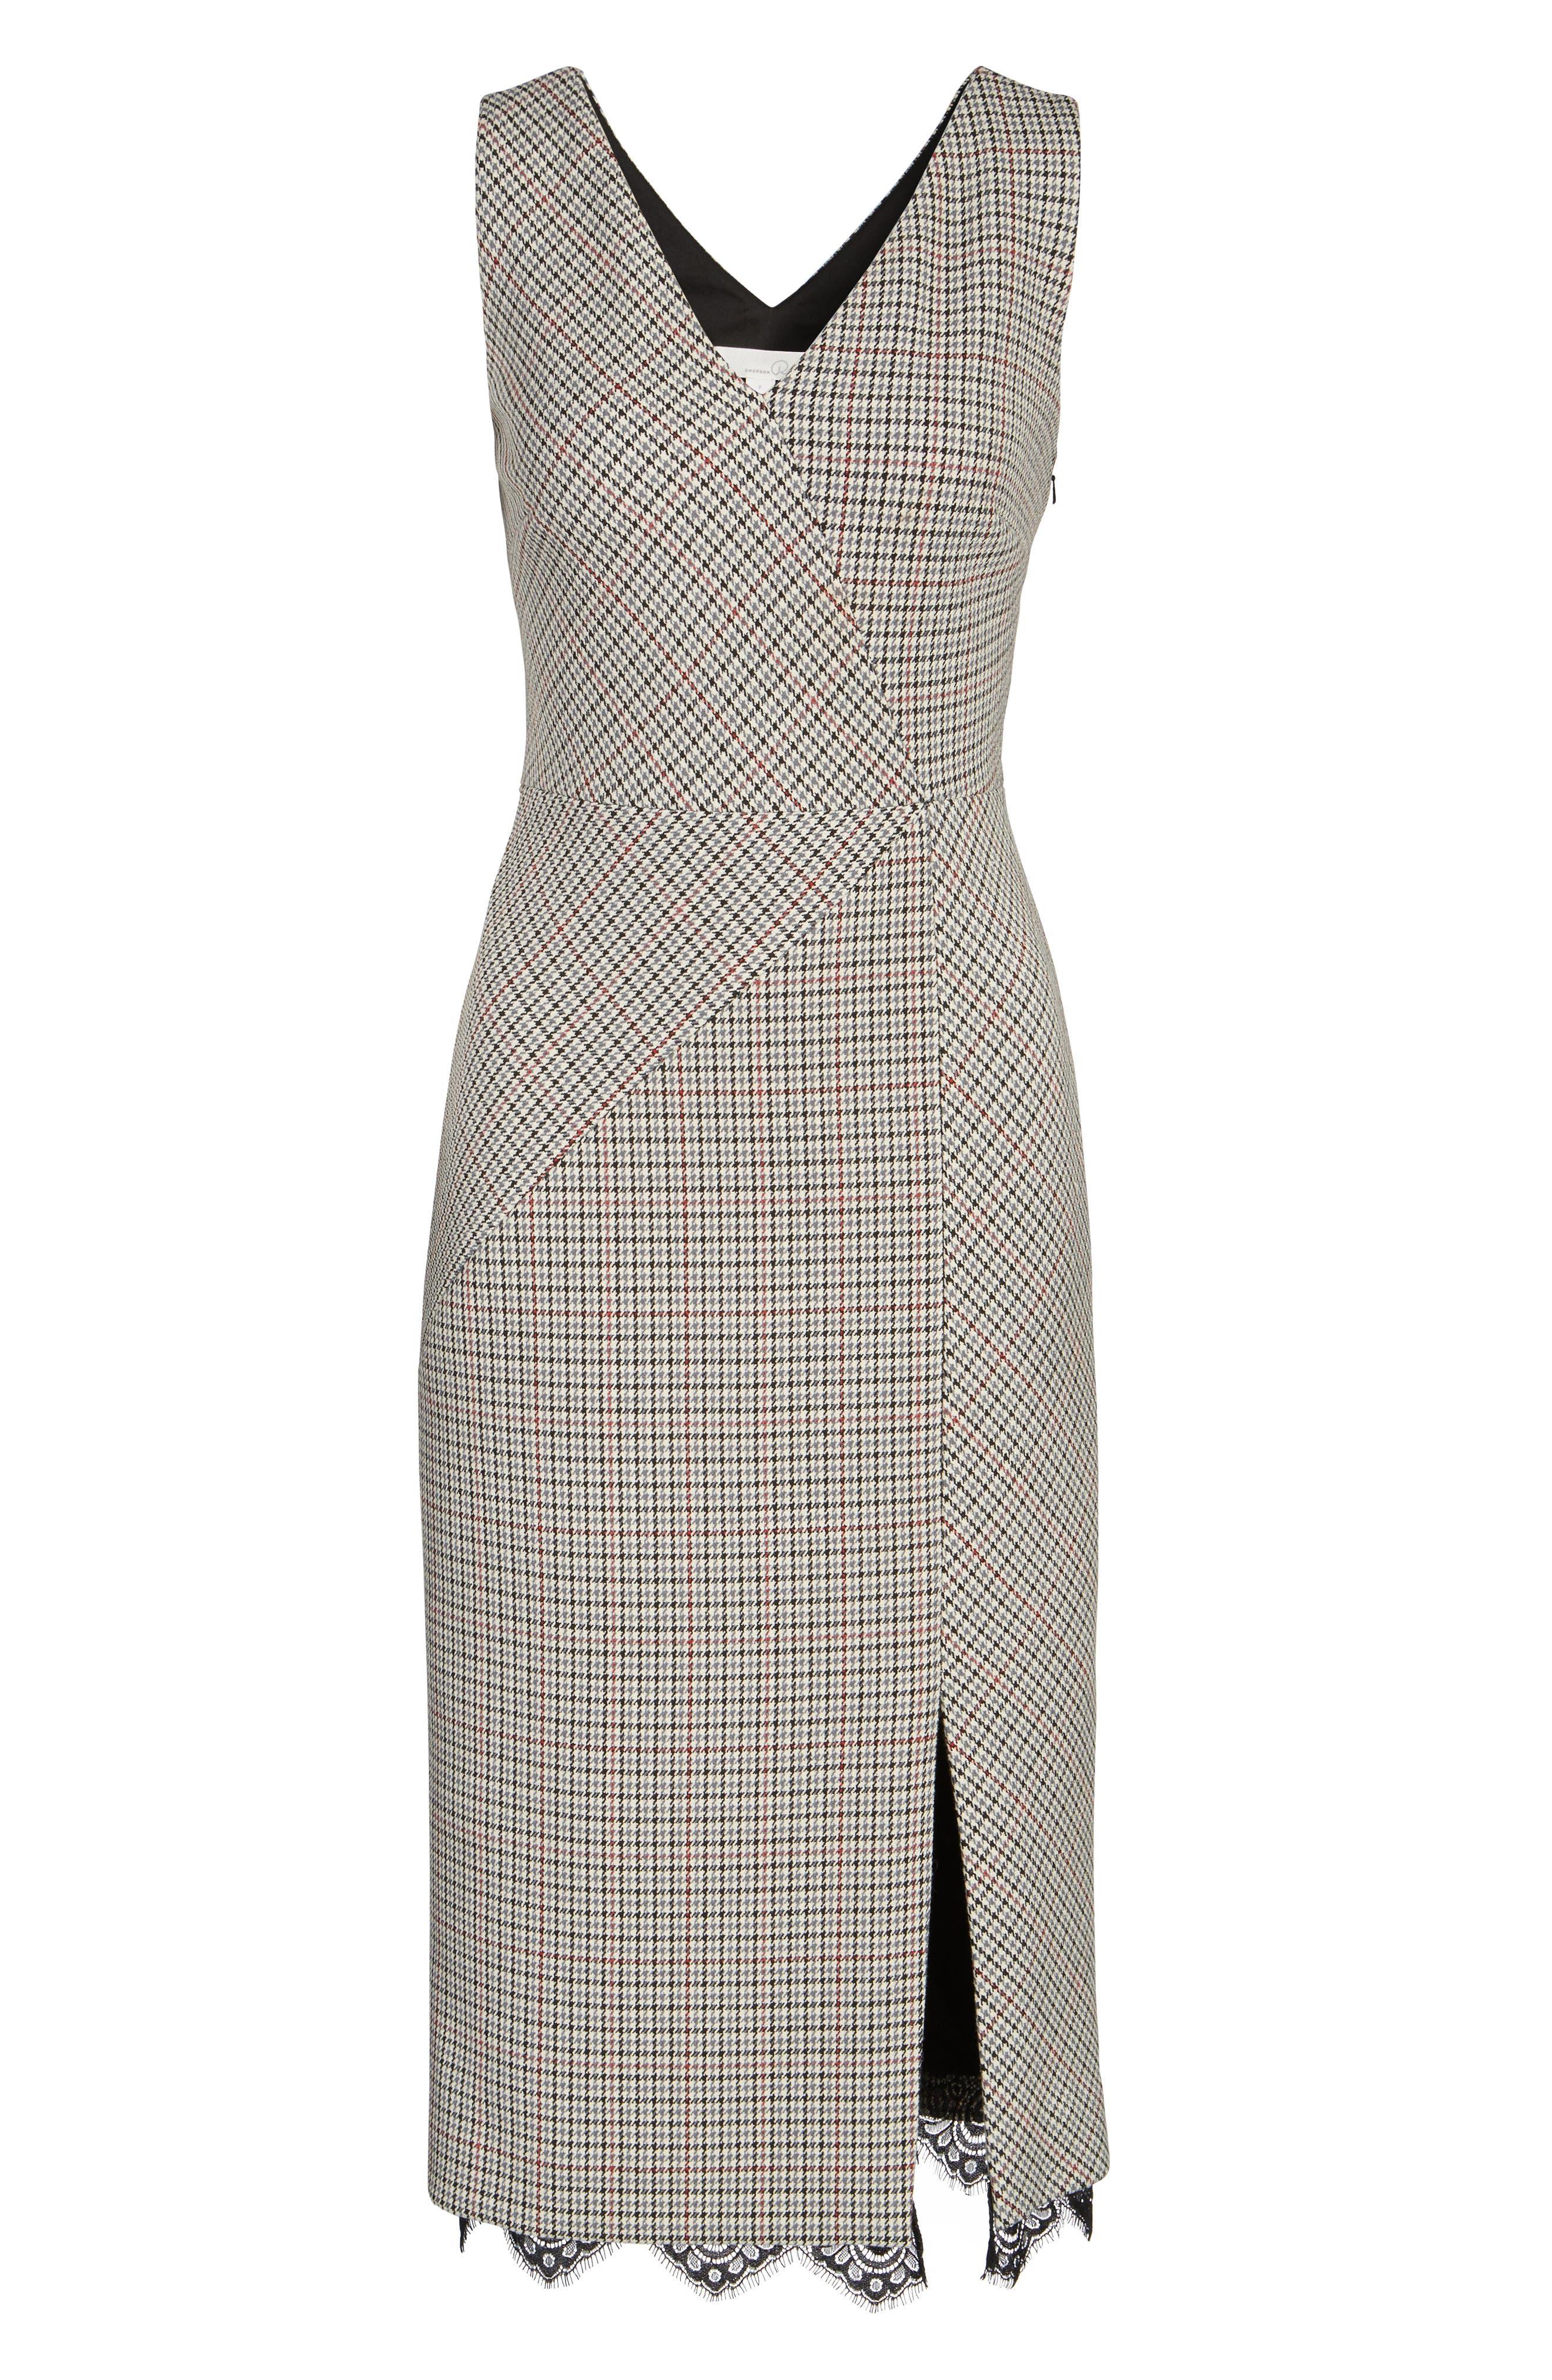 Houndstooth Sheath Dress,                             Alternate thumbnail 6, color,                             270